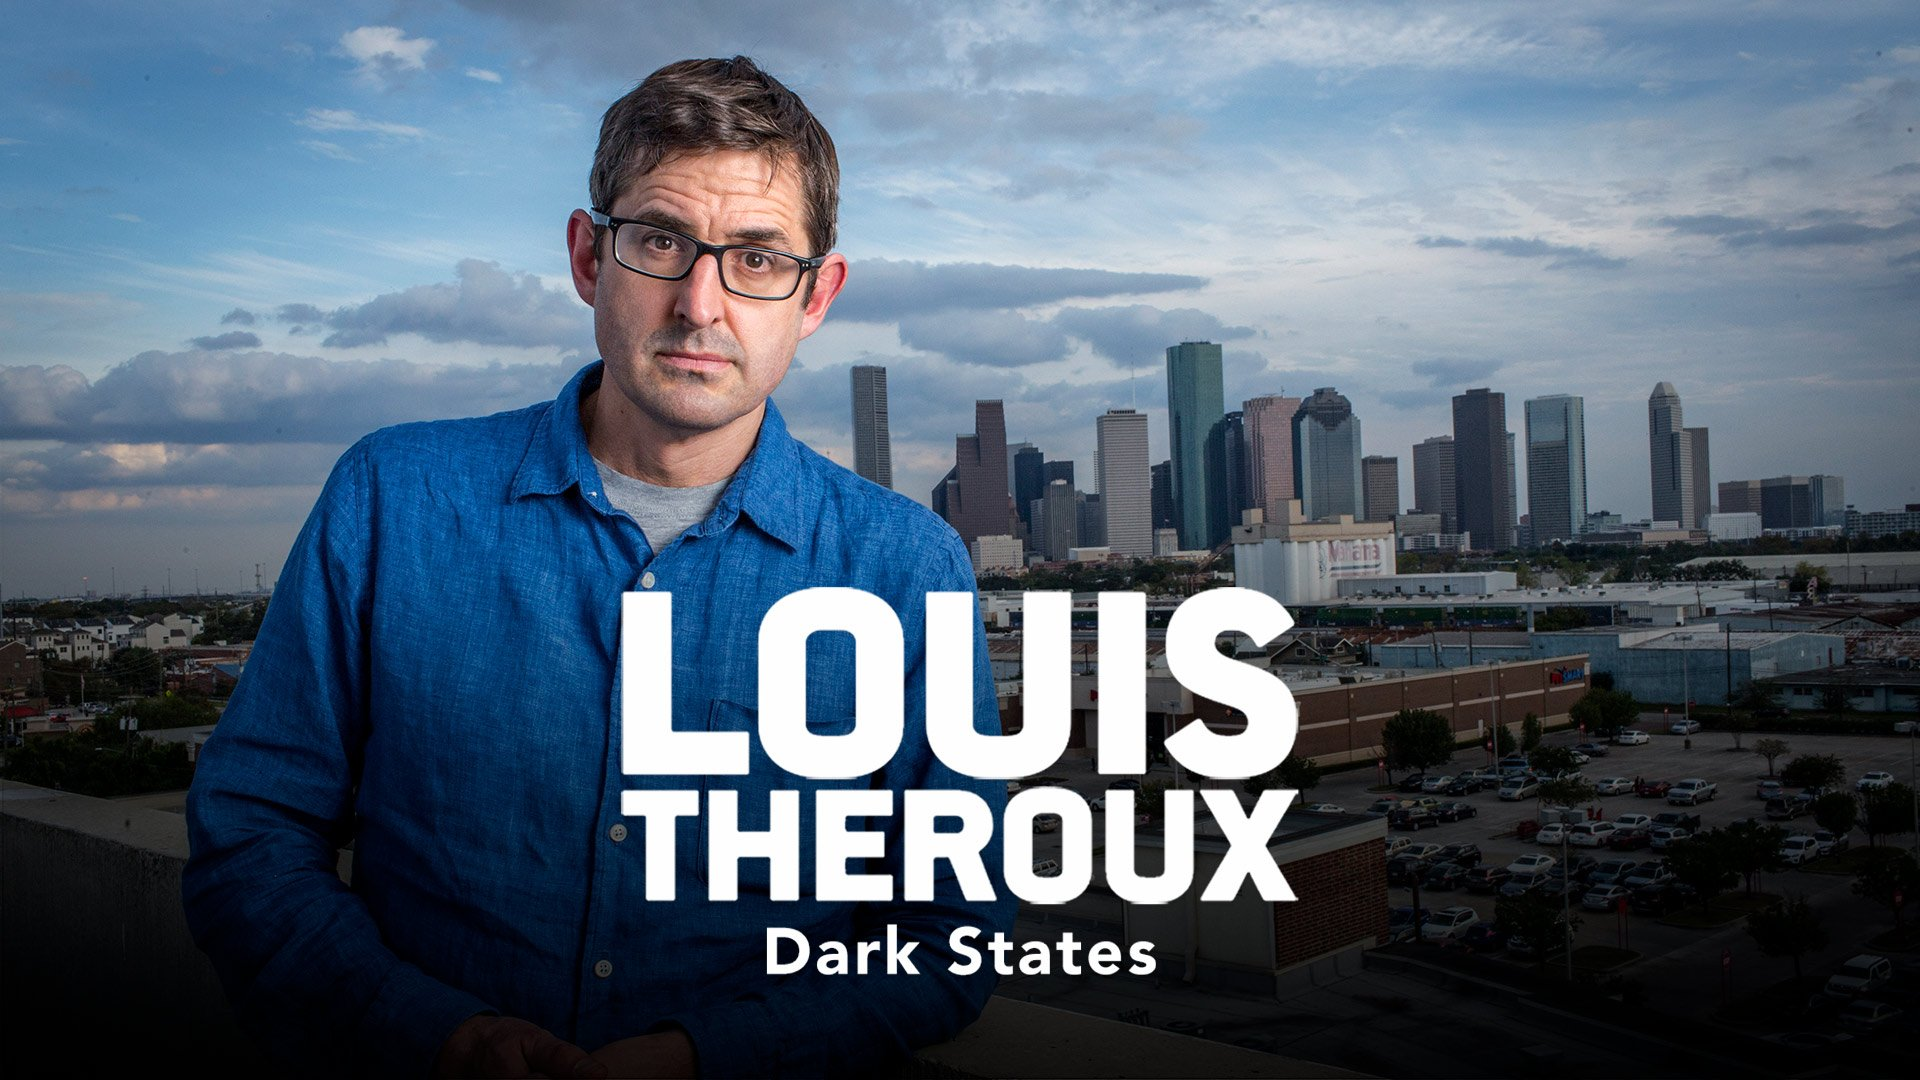 Louis Theroux: Dark States on BritBox UK